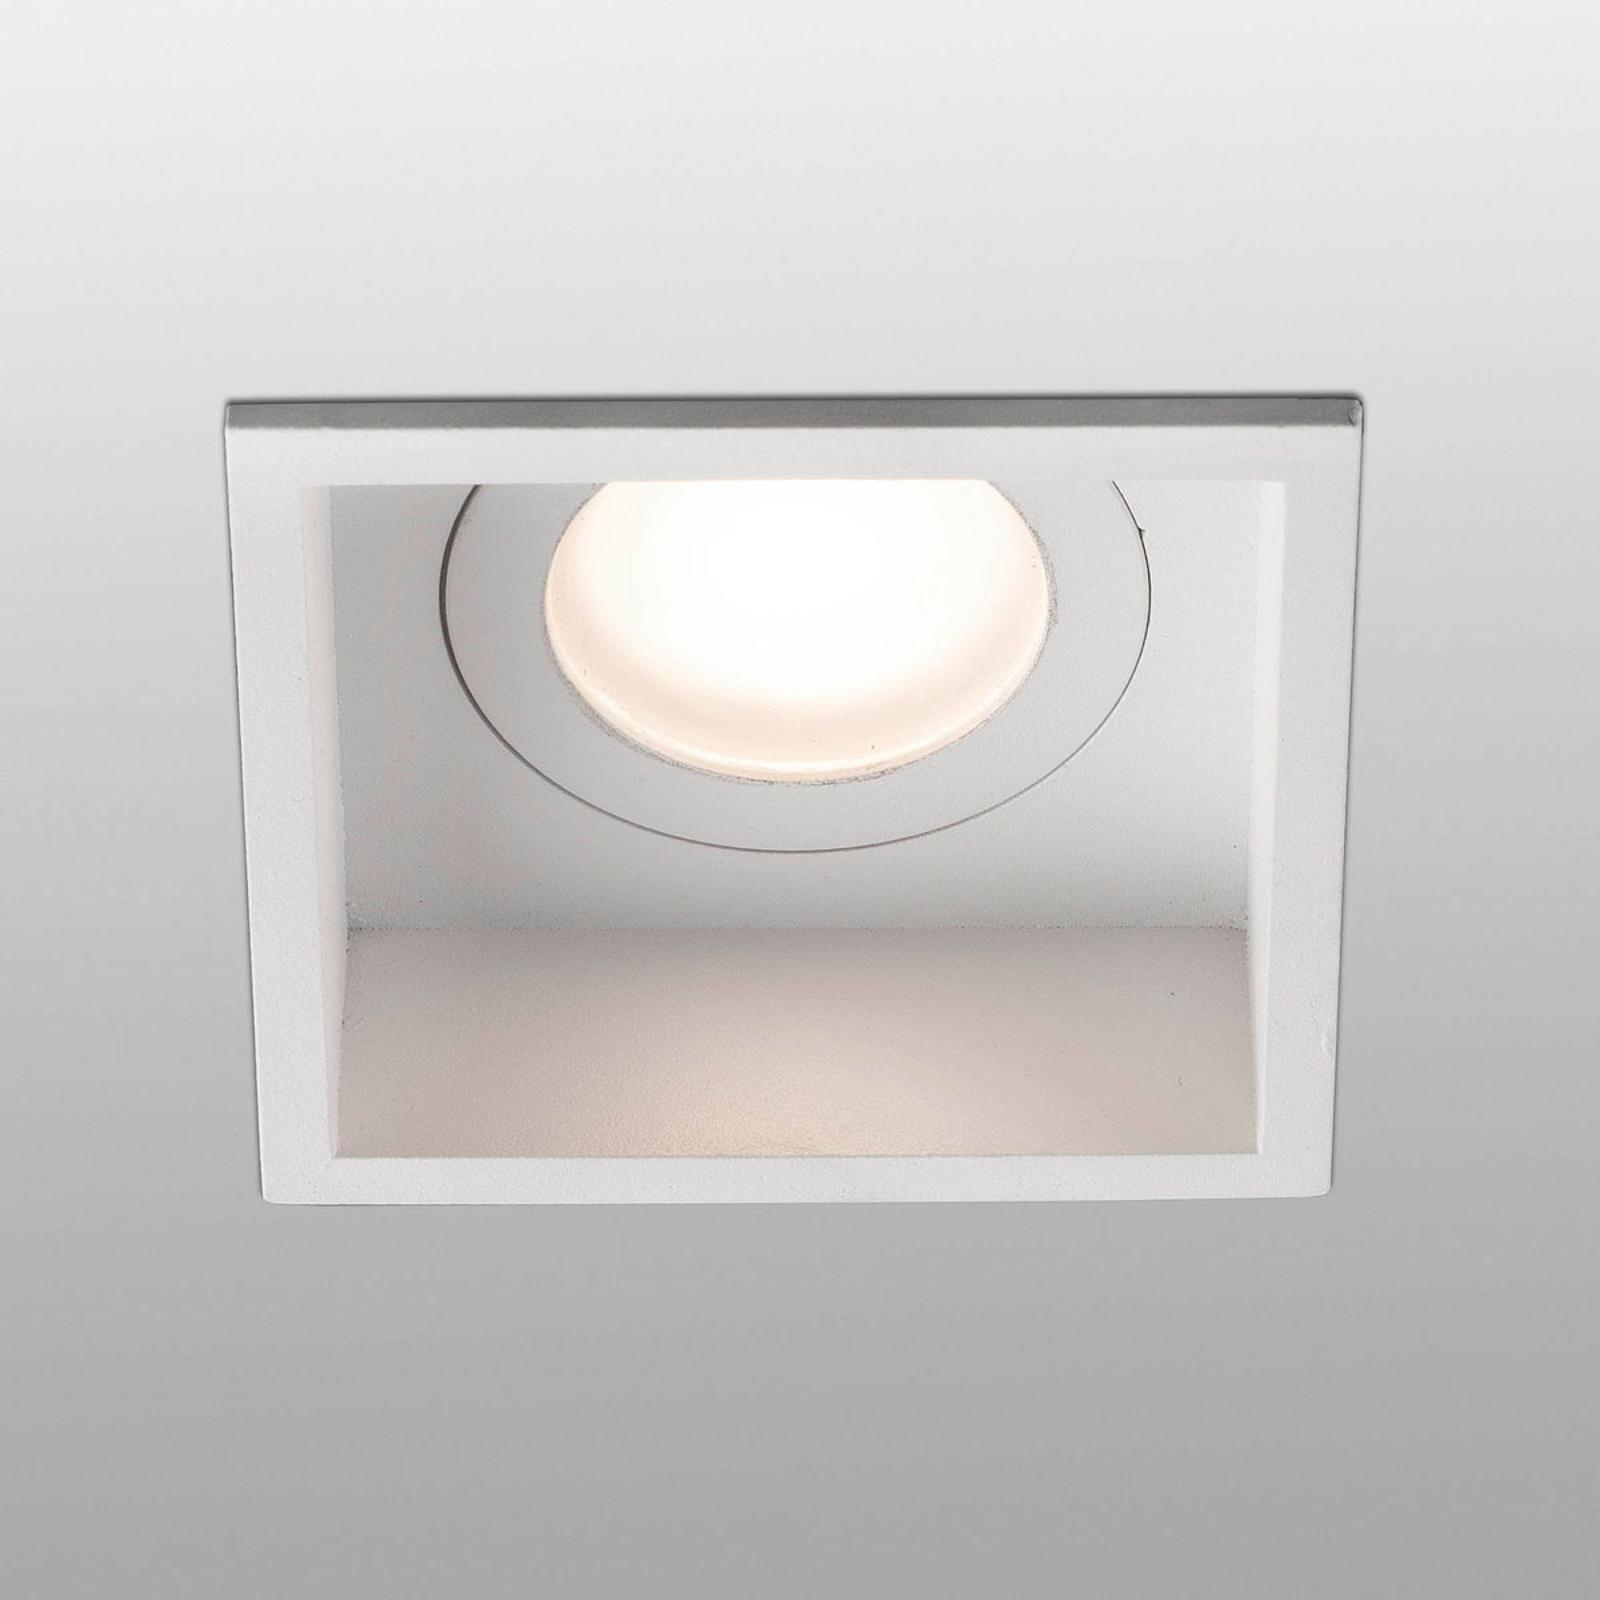 Foco empotrado Hyde 1 luz angular IP44 blanco